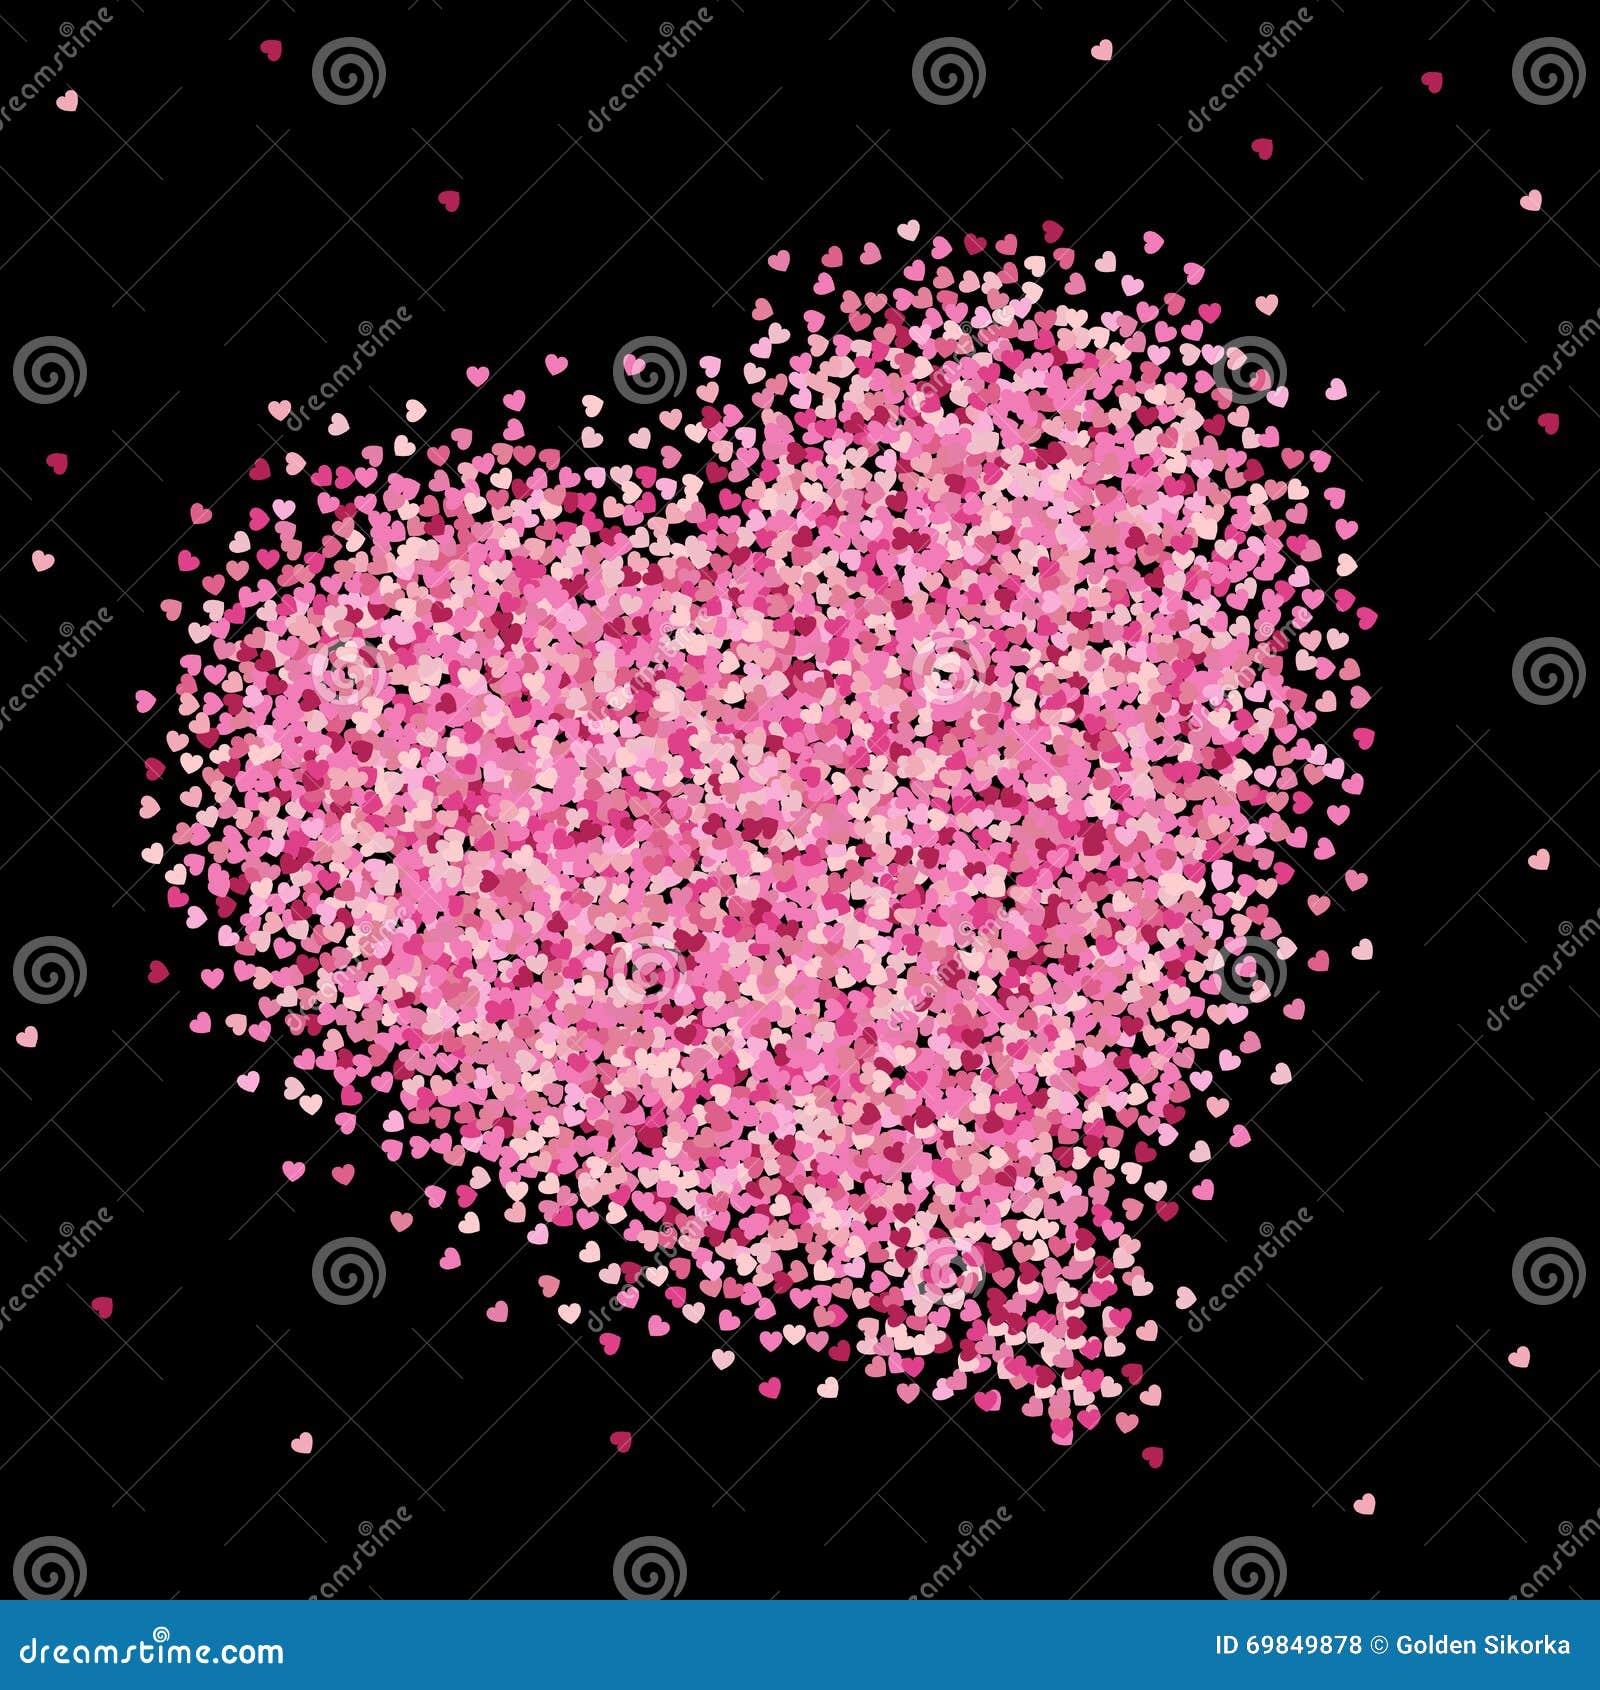 Romantic Card Romantic Heart Happy Valentines Day Card – Romantic Valentine Day Cards